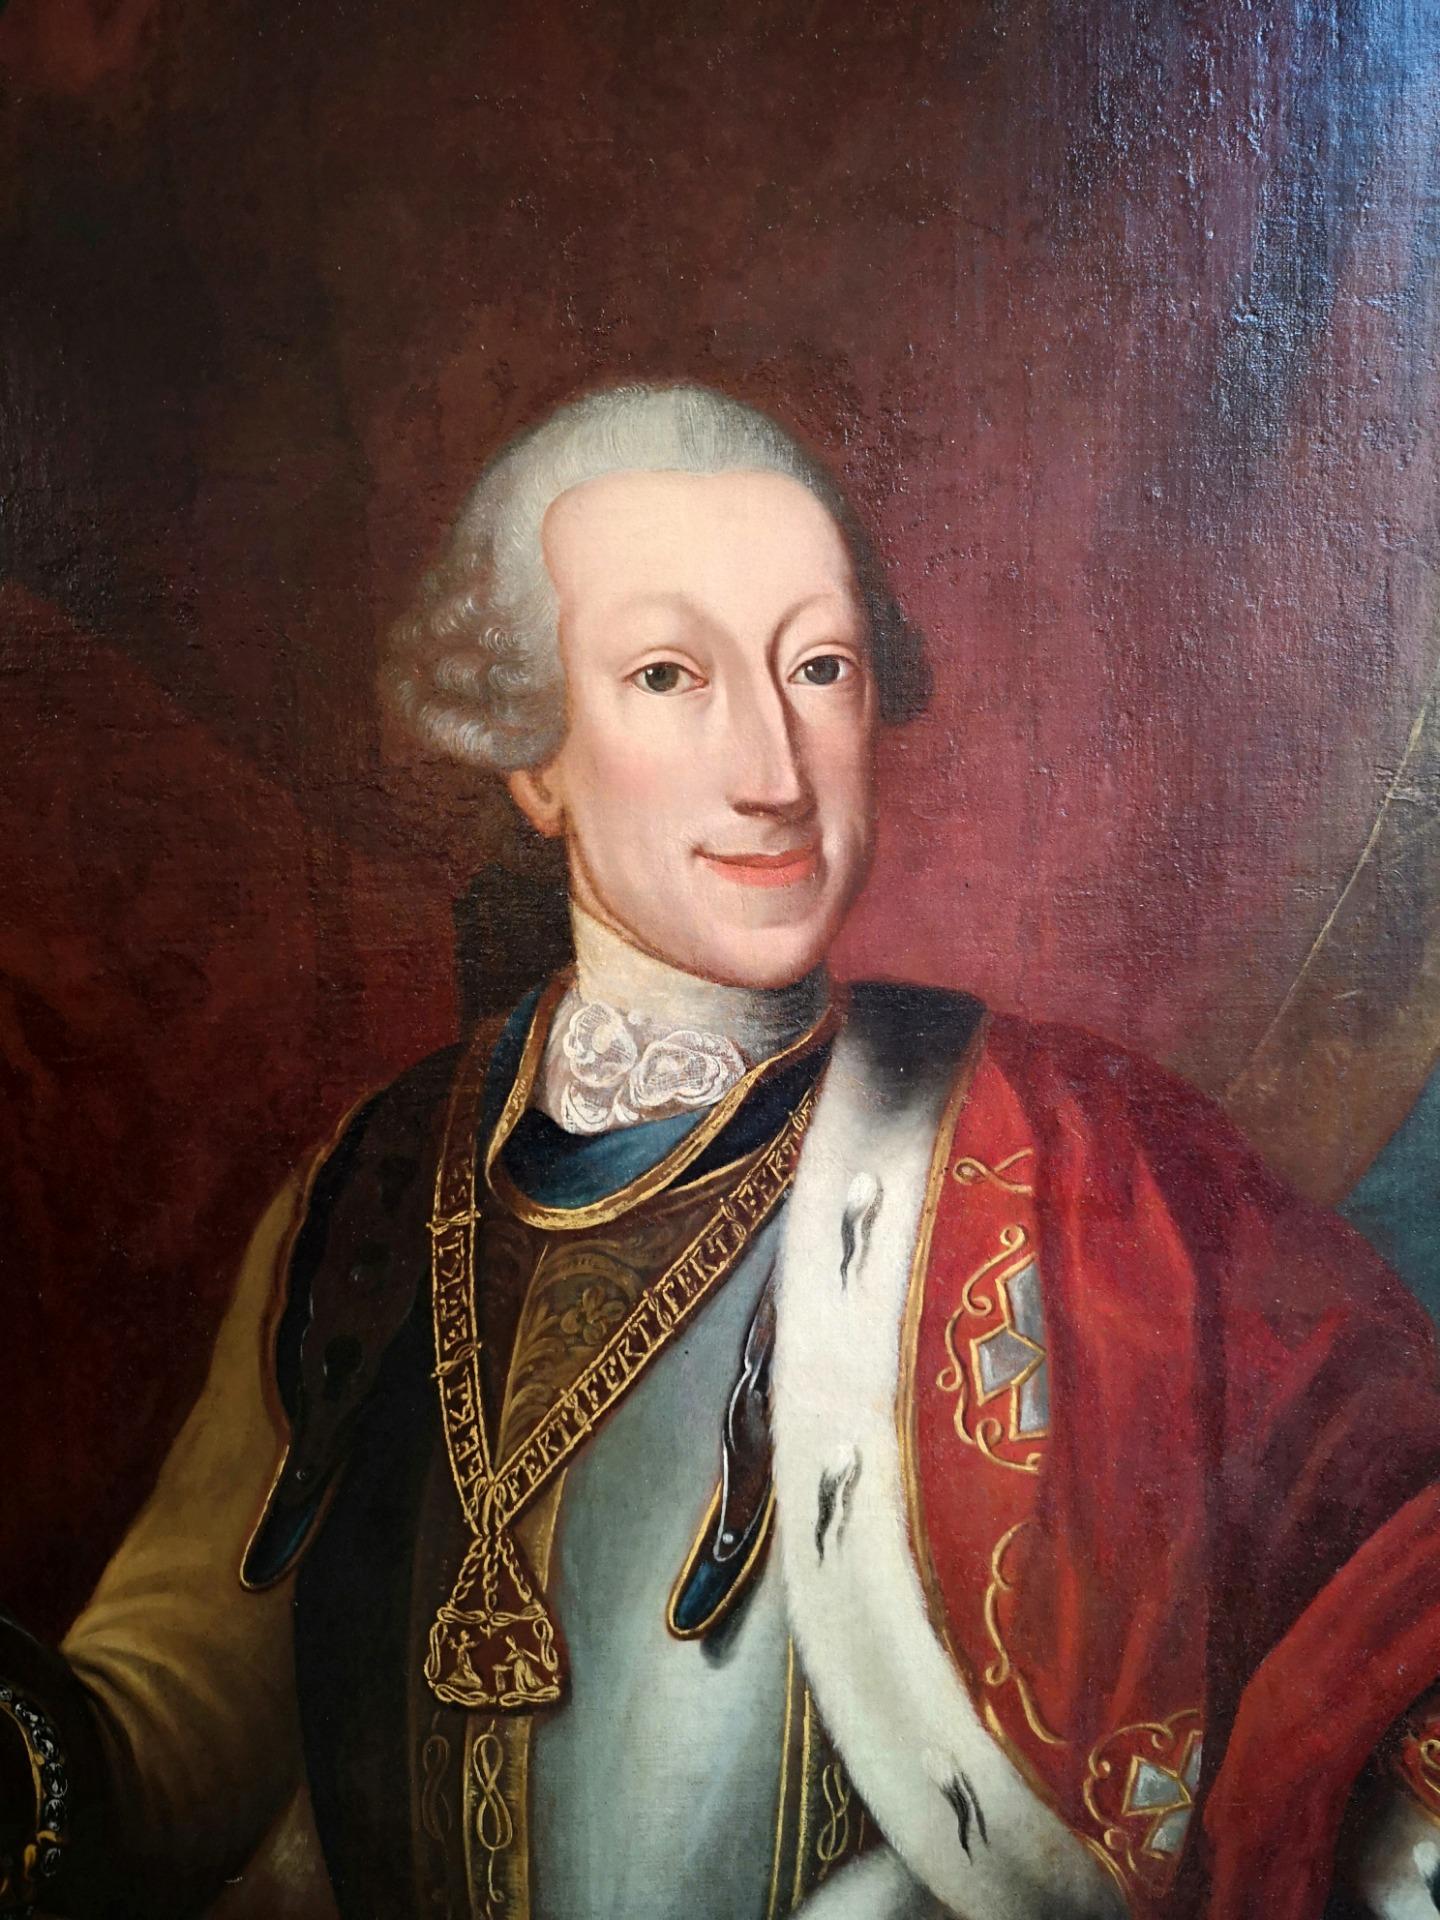 thumb2|Dipinto olio su tela , raffigurante Carlo Emanuele III di Savoia: epoca: metà 700